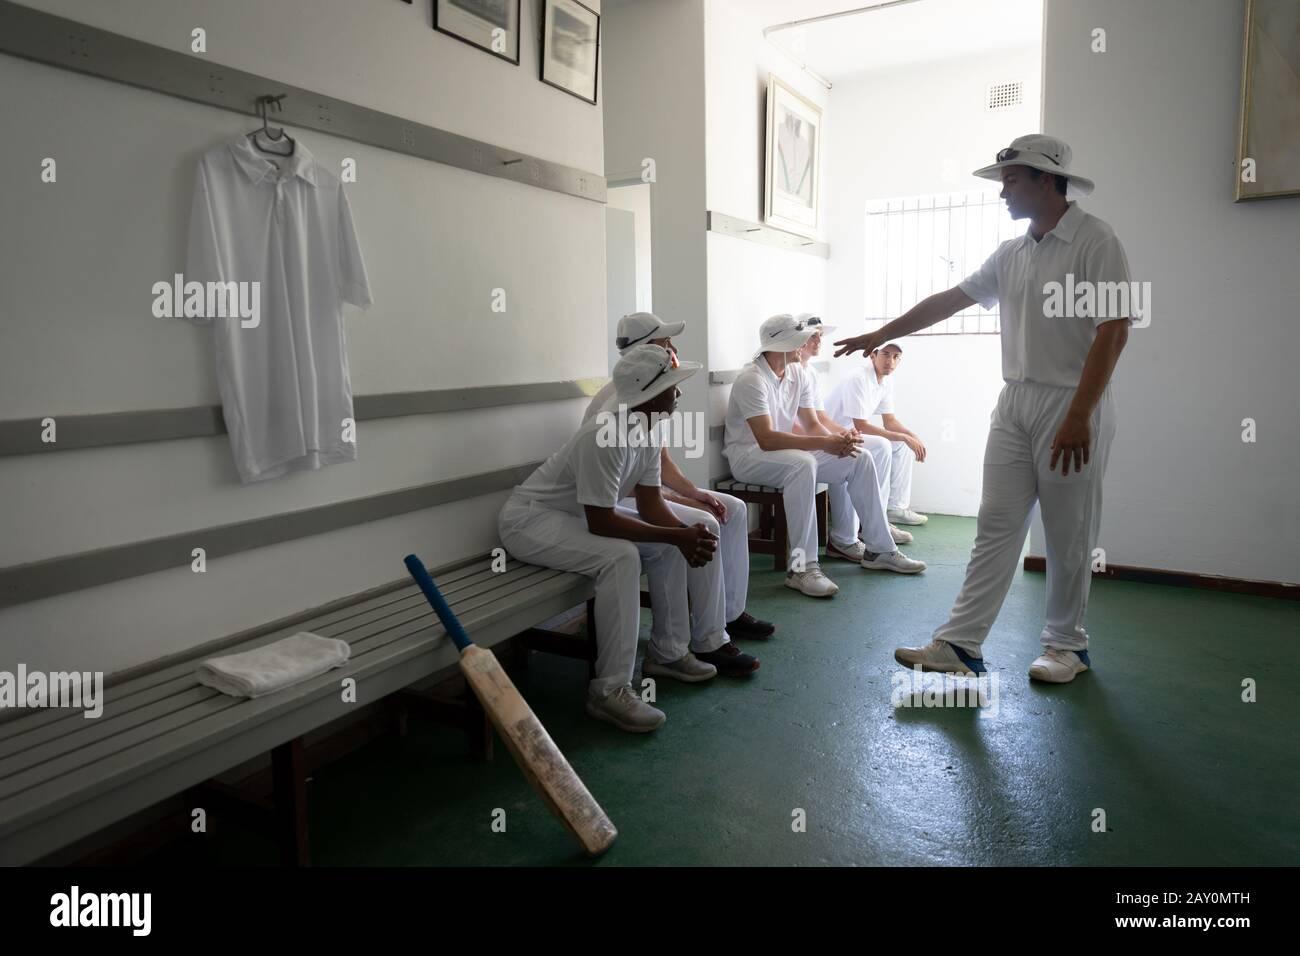 Team in the locker room preparing the game Stock Photo